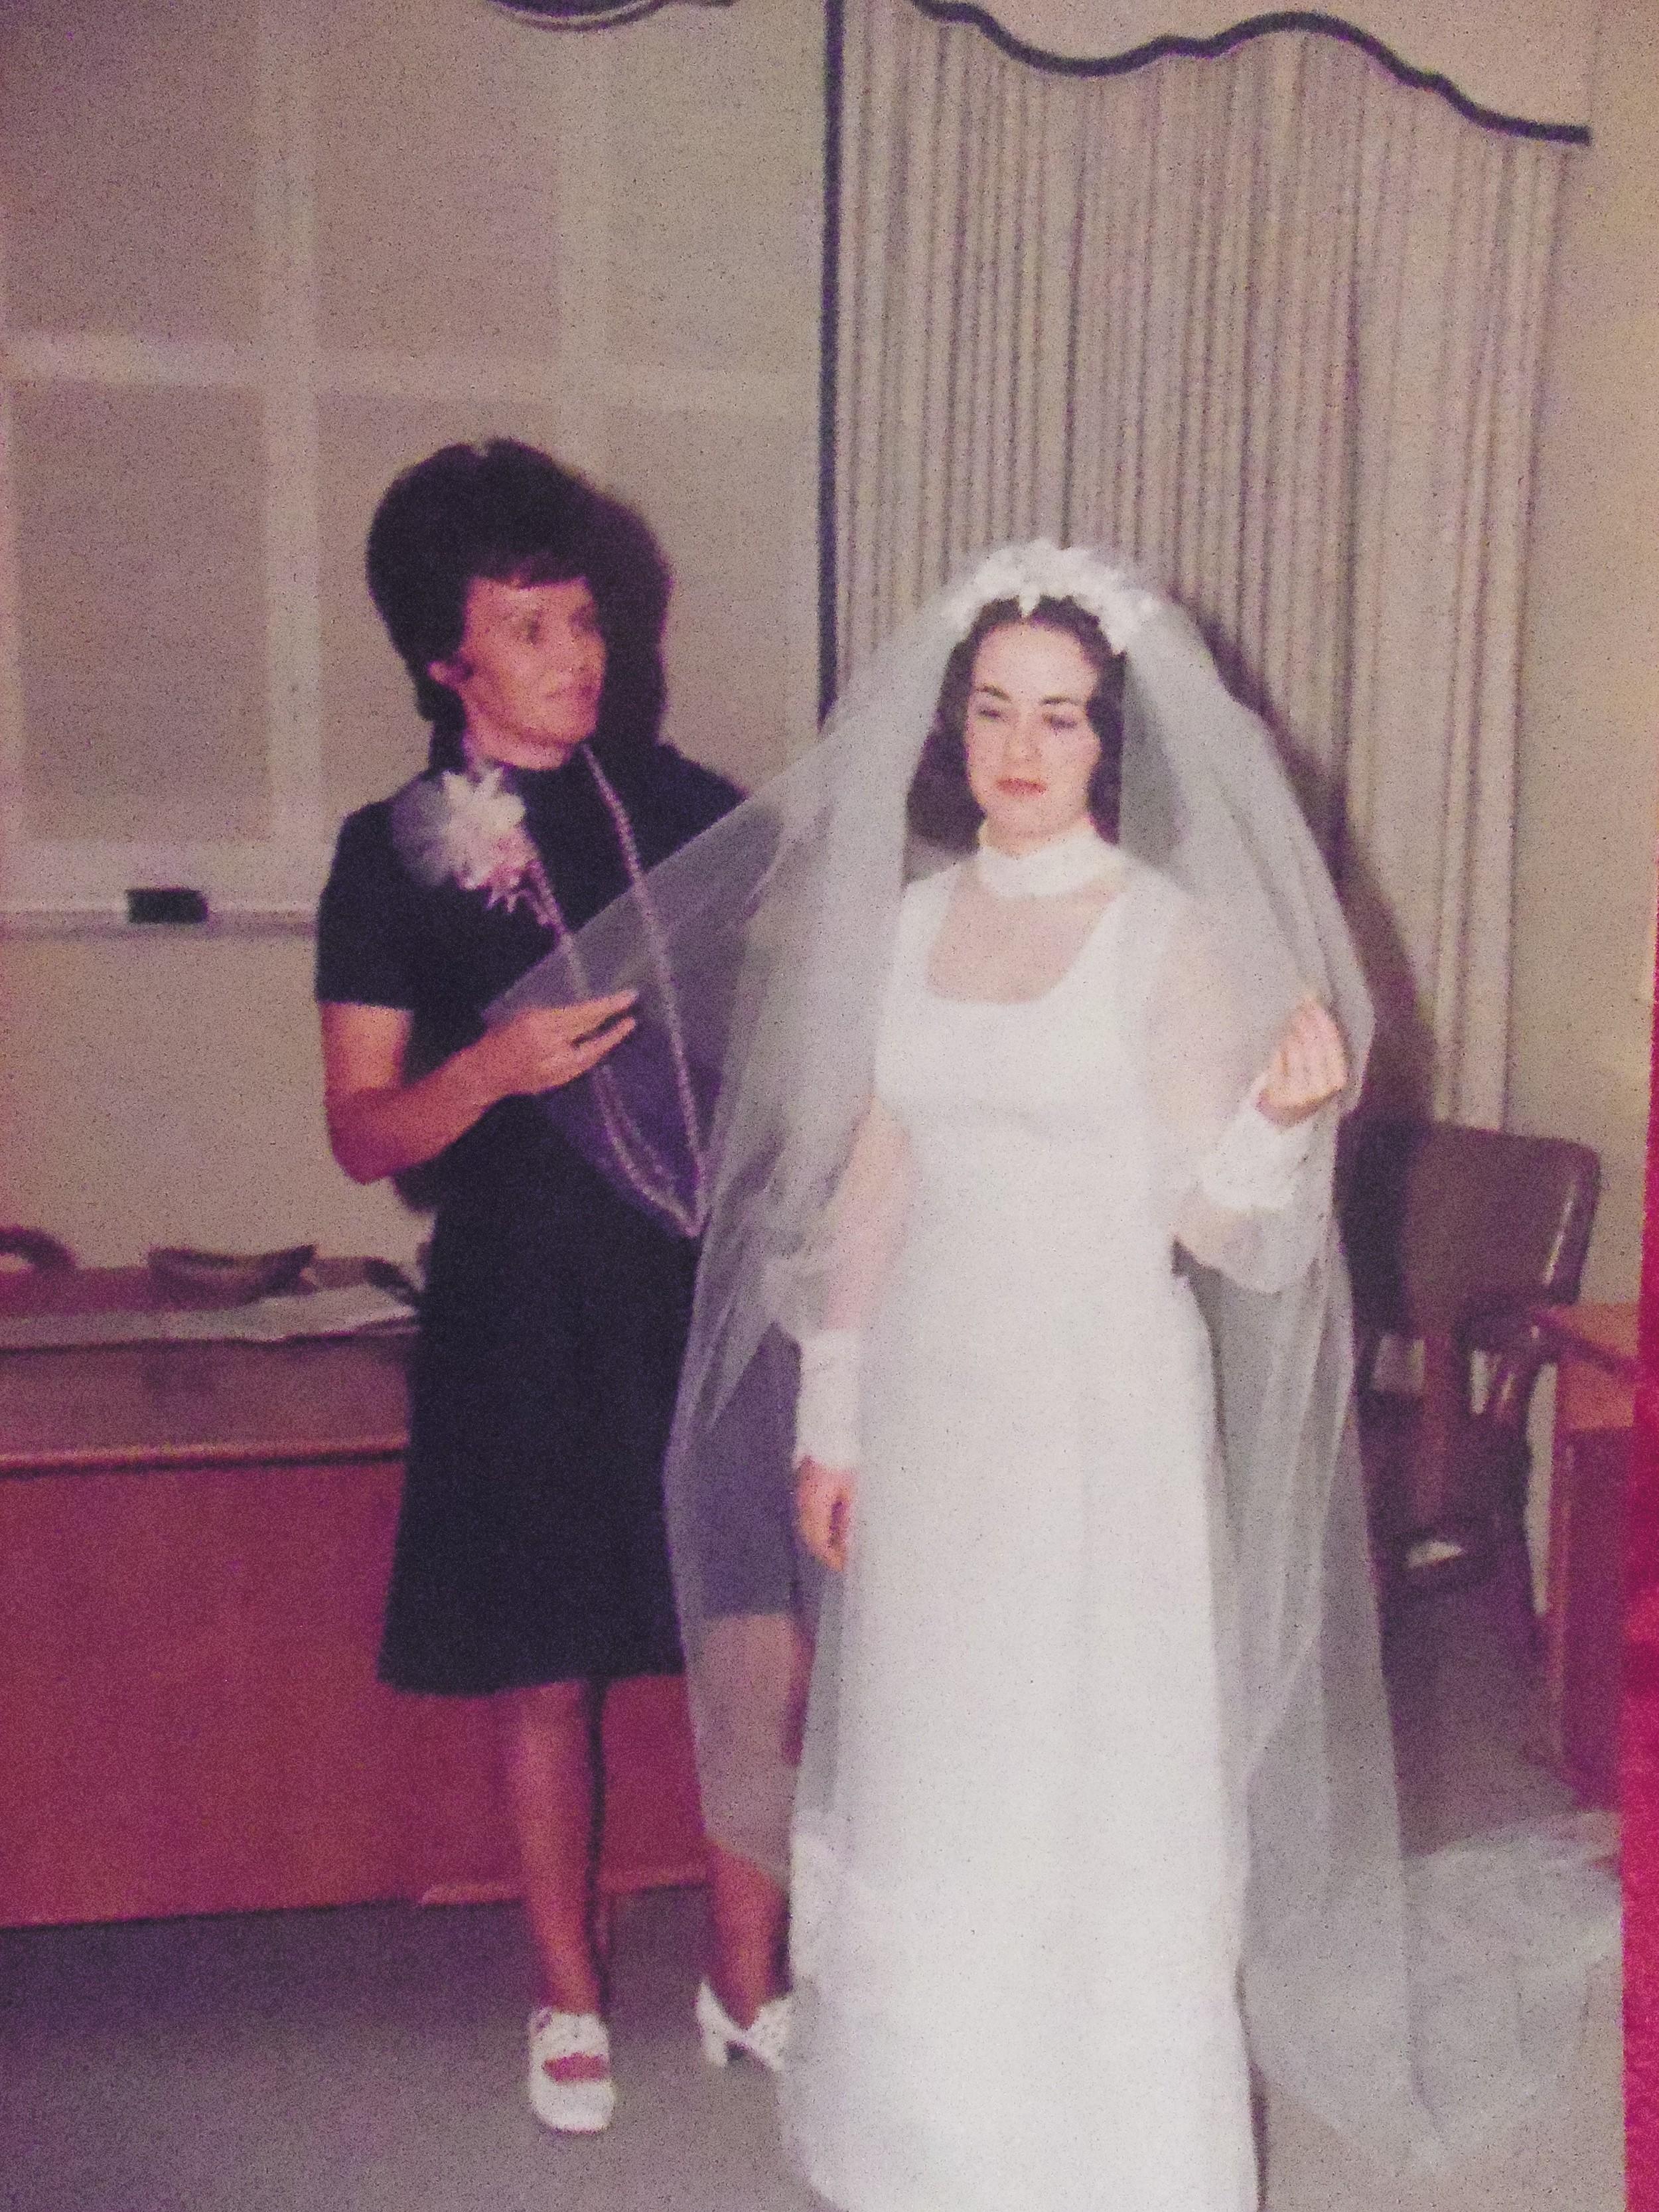 MARIE WILCOX  KATHY WILCOX STORRIE  1973